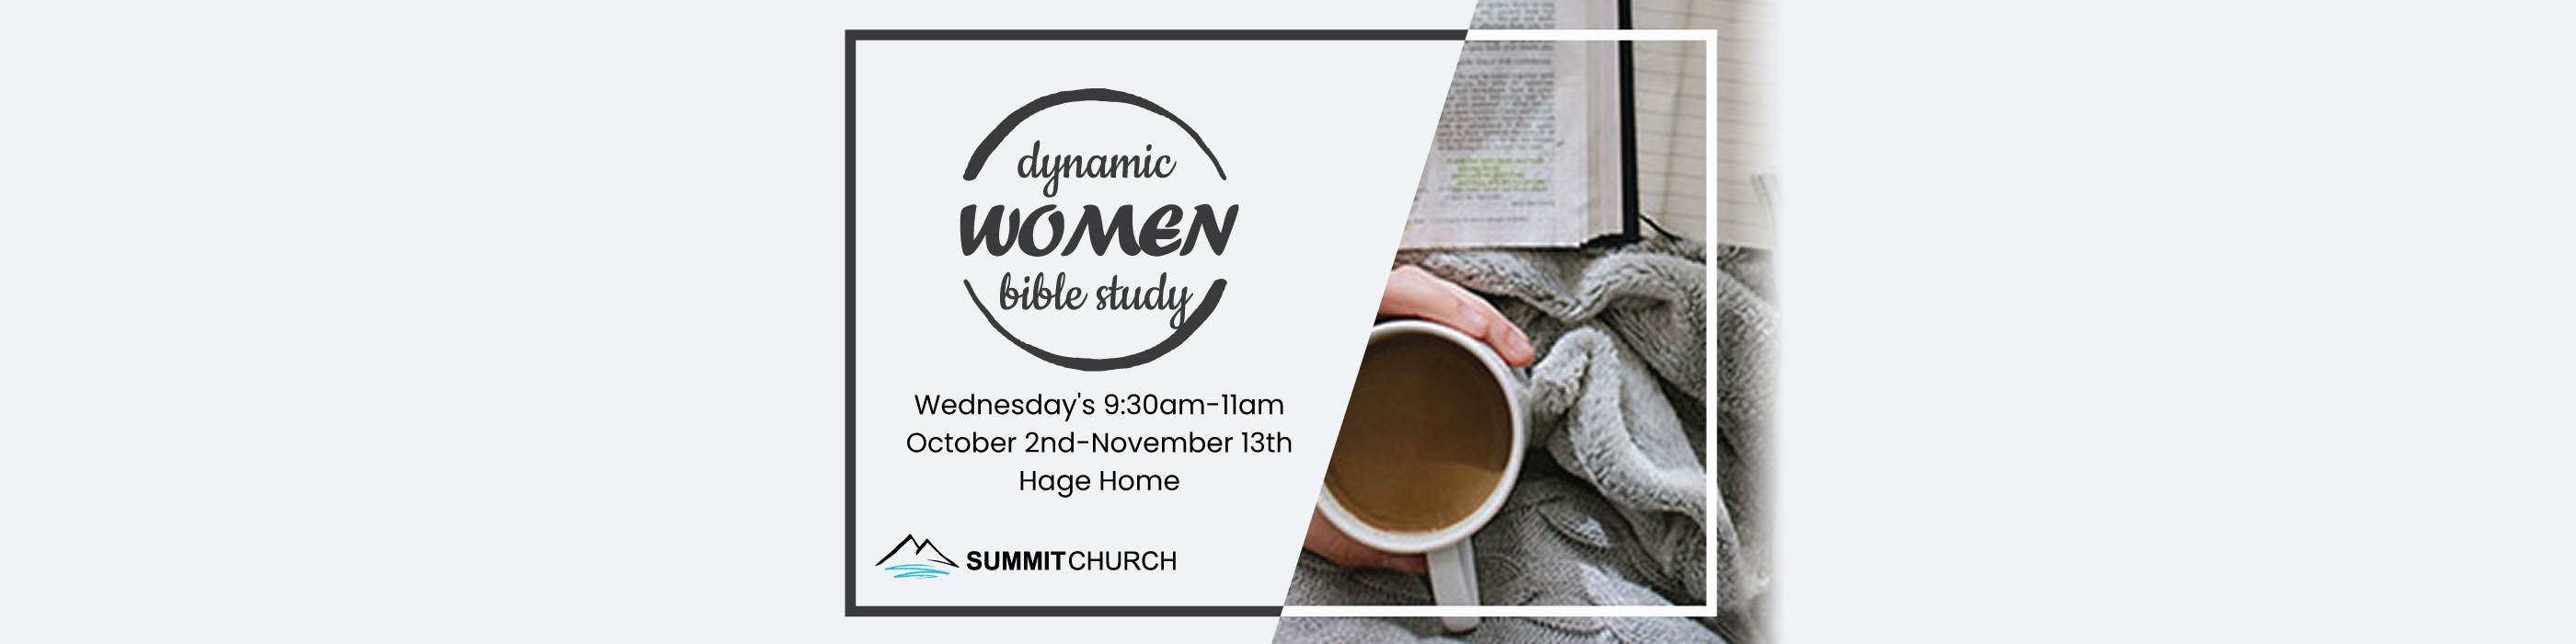 dynamic-women-bible-fall-2019-WEB-2800x700